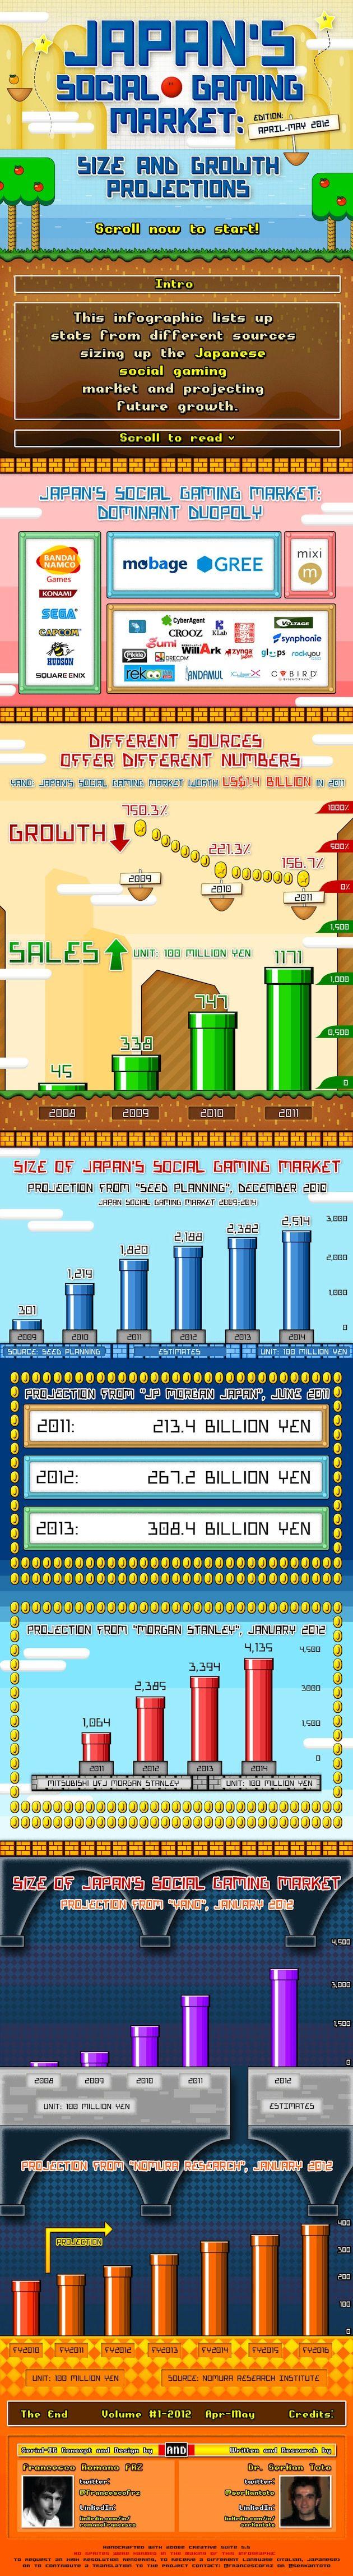 Japan's Social Gaming Market [Infographic]Games Infographic, Digital Marketing, Games Marketing, Social Media, Social Games, Media Infographic, Digital Infographic, Marketing Infographic, Japan Social